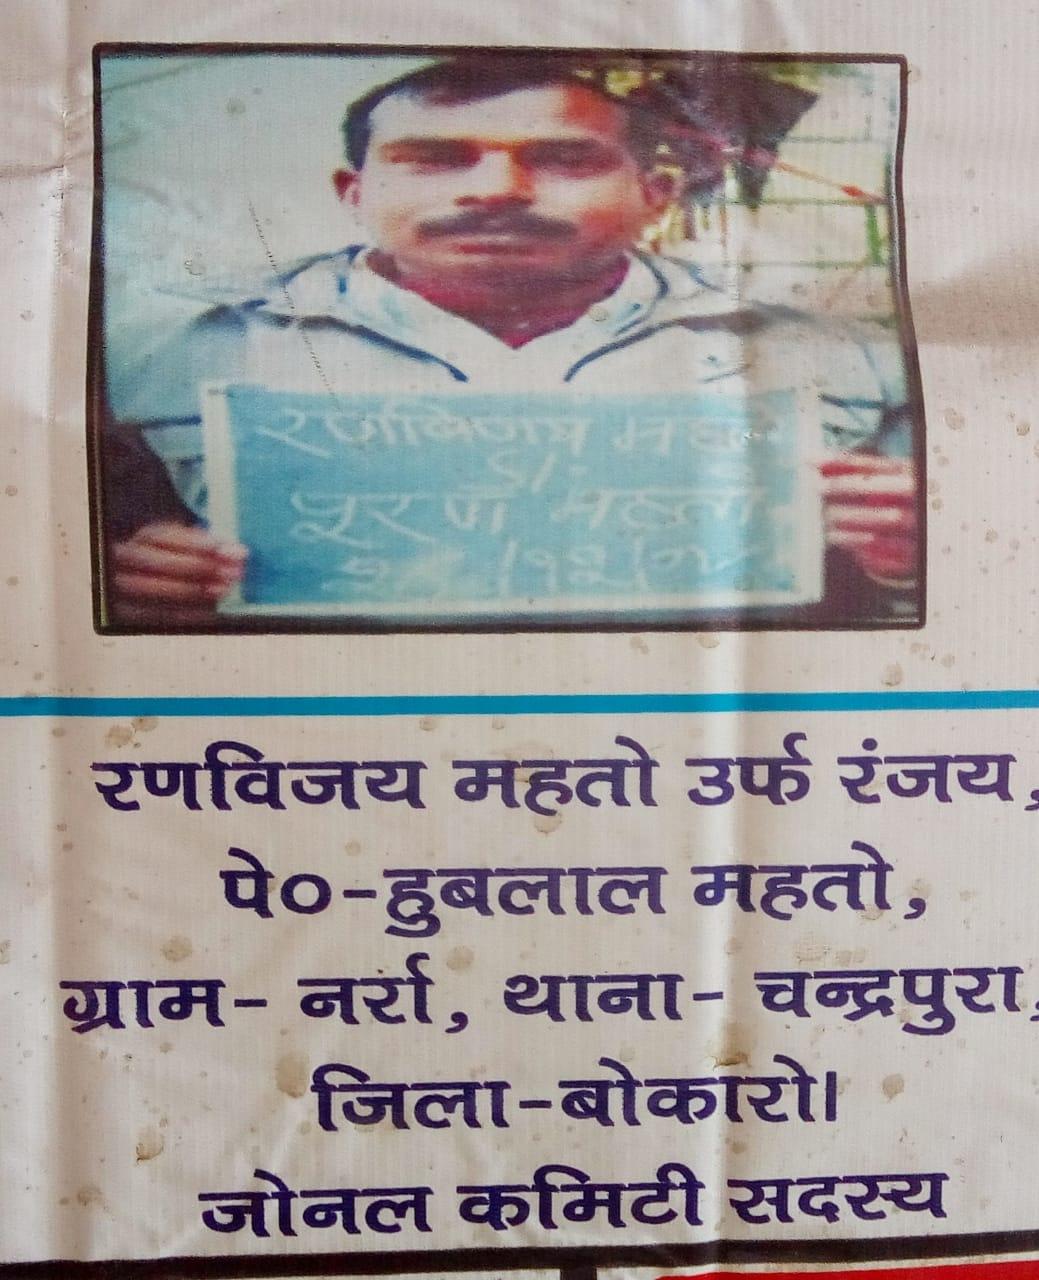 Jharkhand, नक्सली, रणविजय महतो